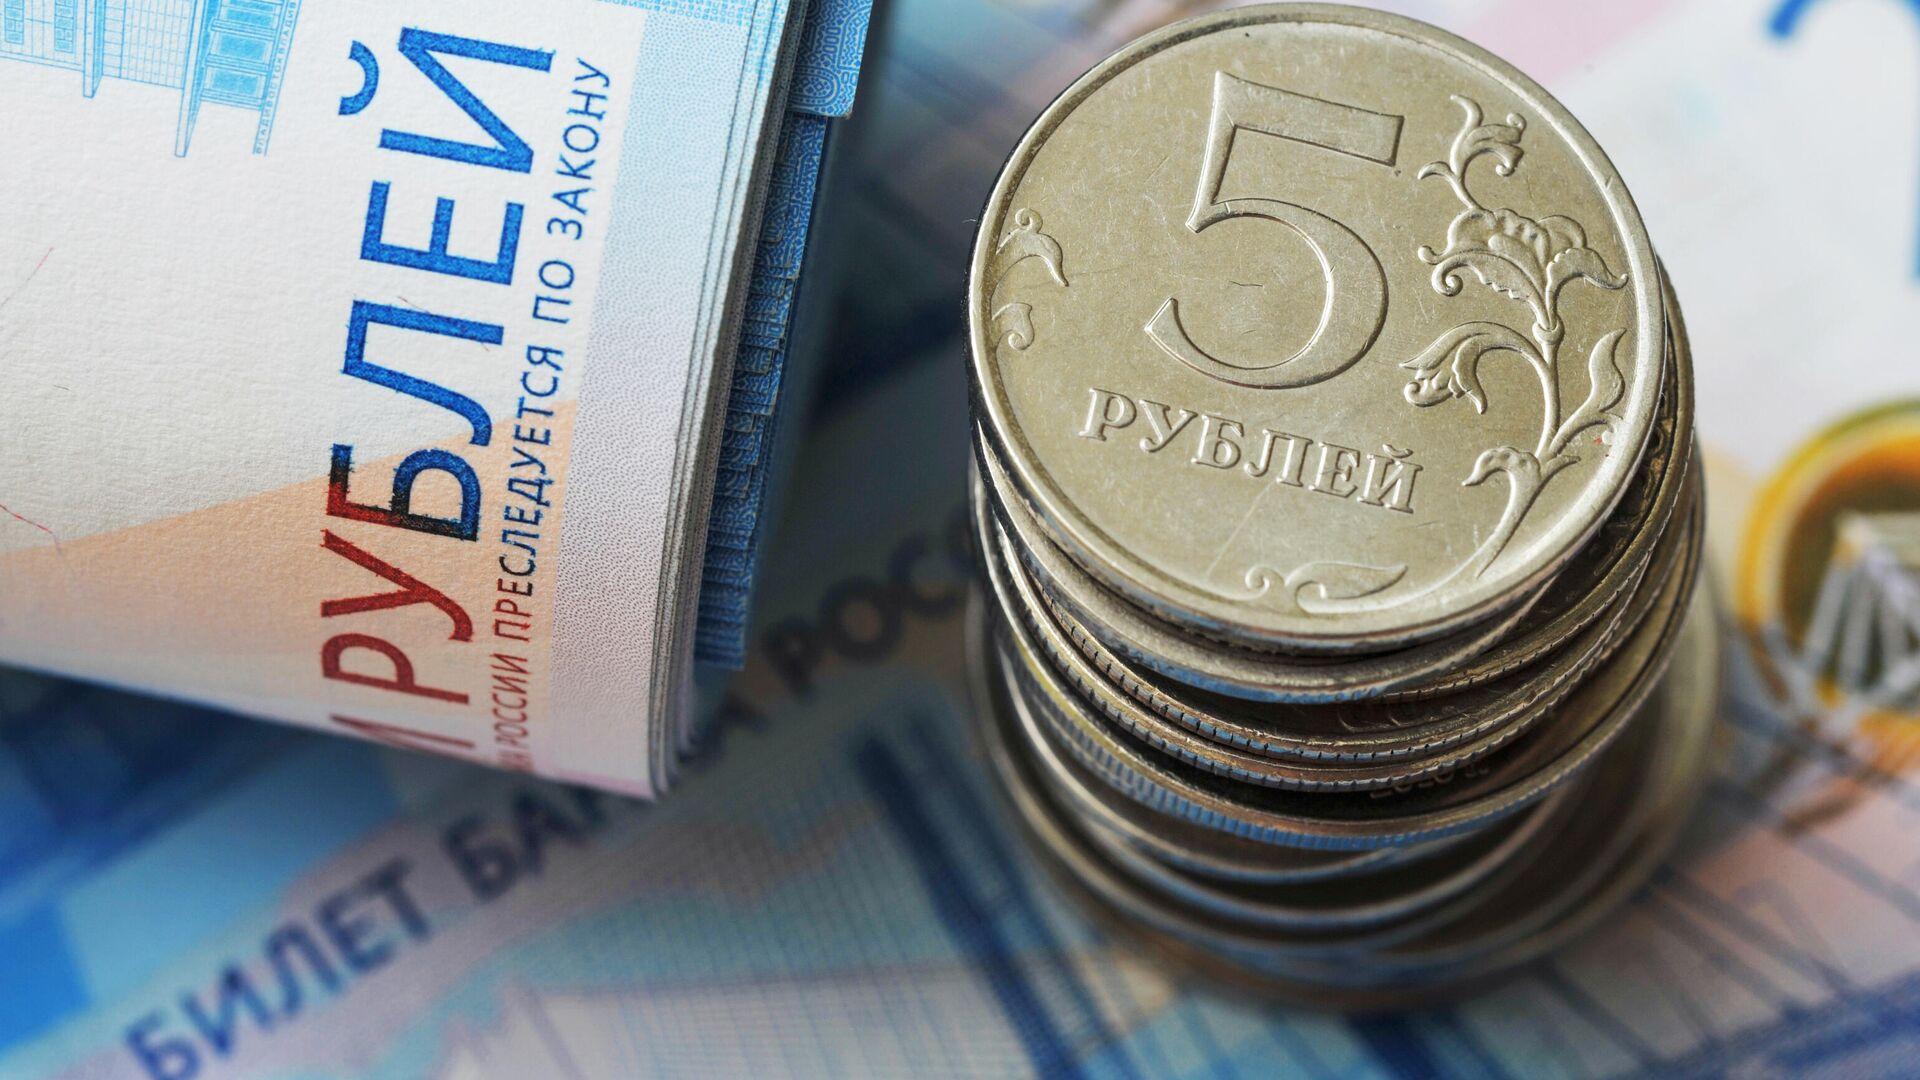 Аналитики оценили обвал курса рубля за последние 30 лет